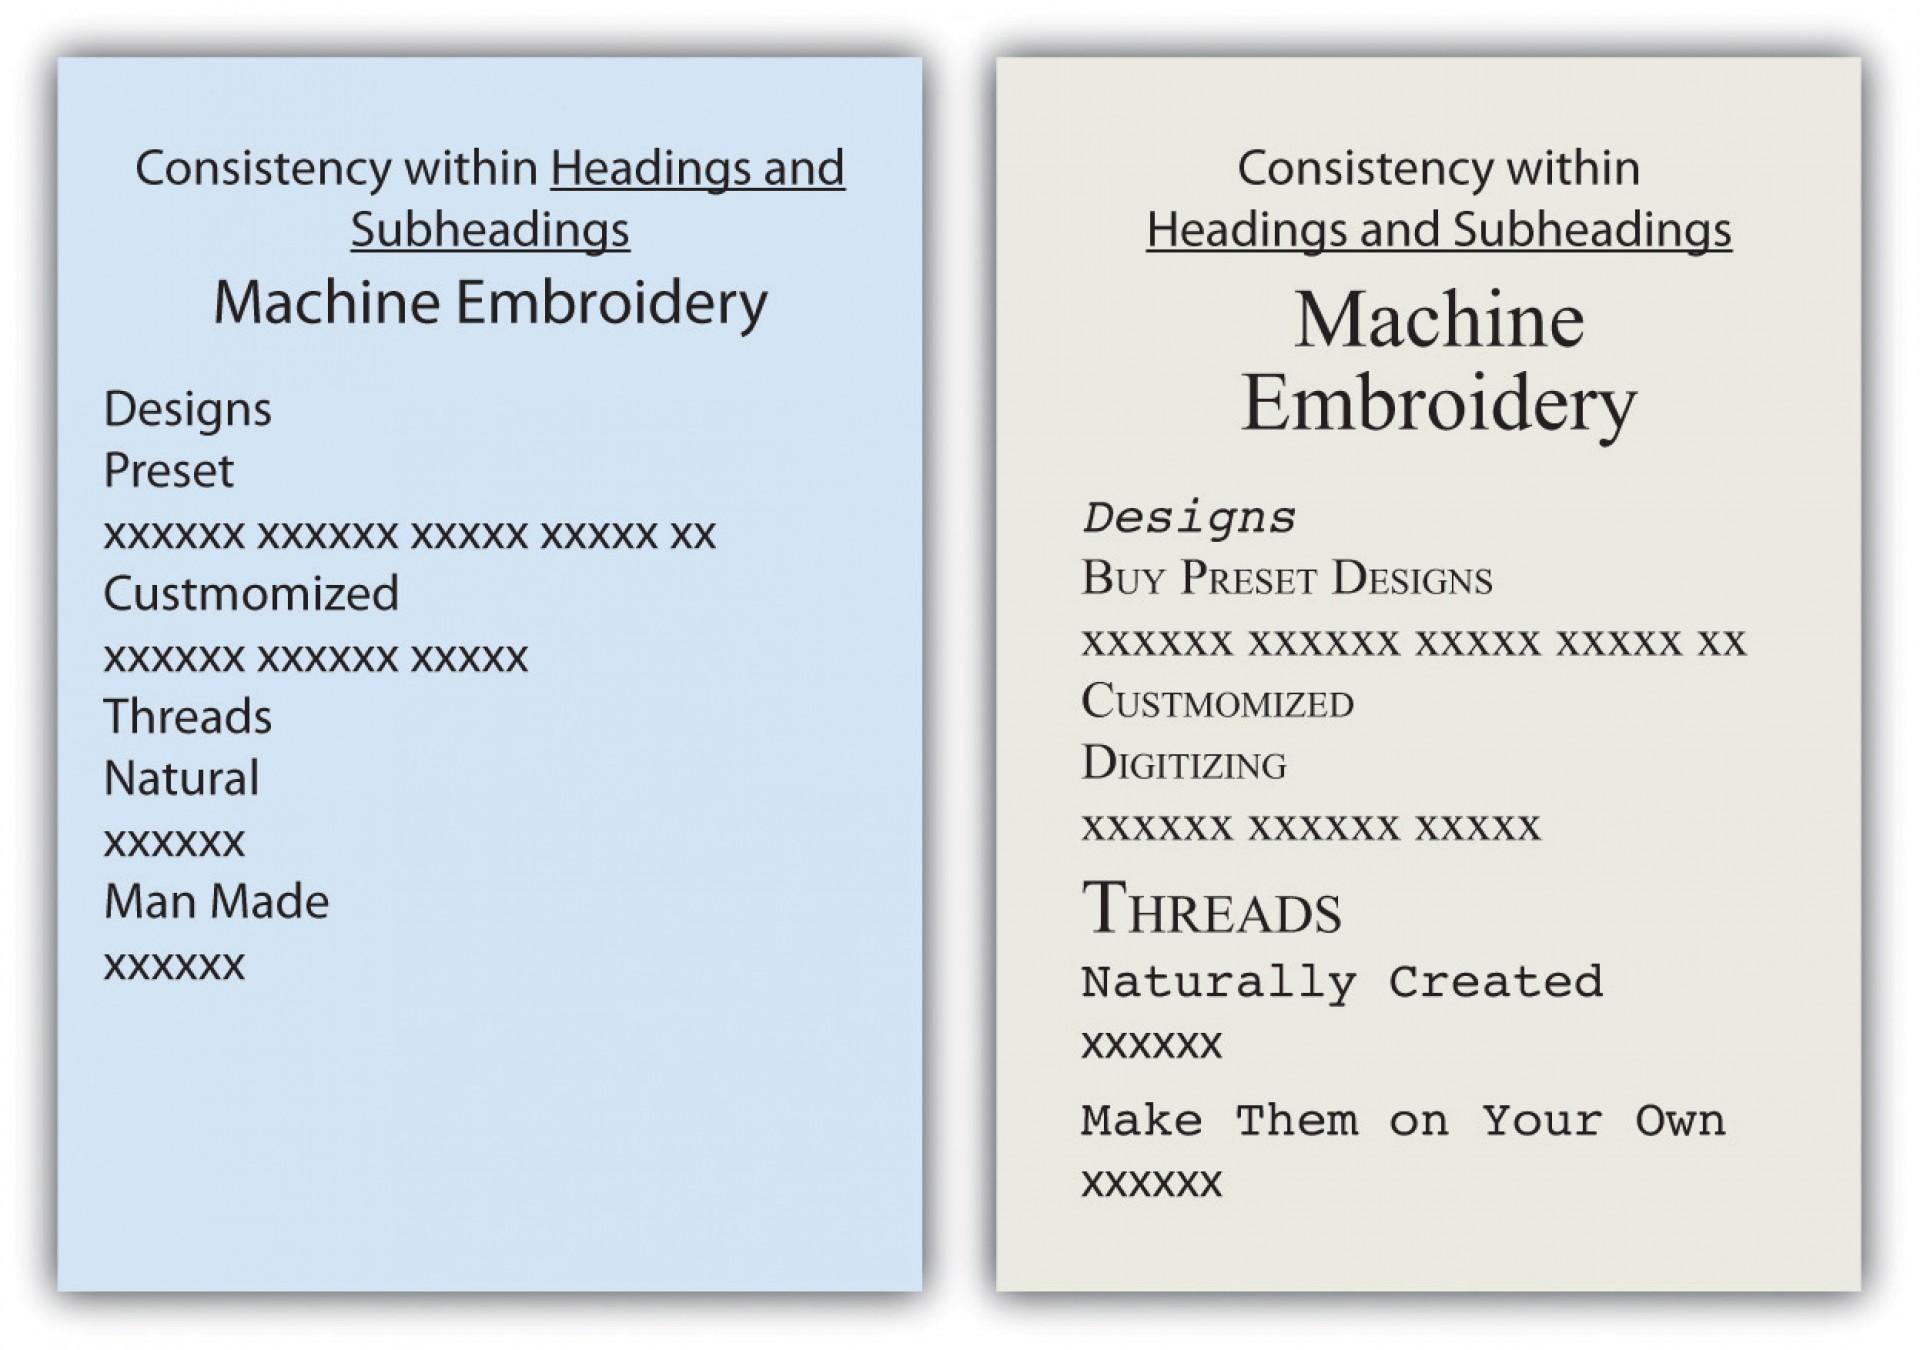 005 Essay Example Subheadings Surprising Format Academic Writing 1920